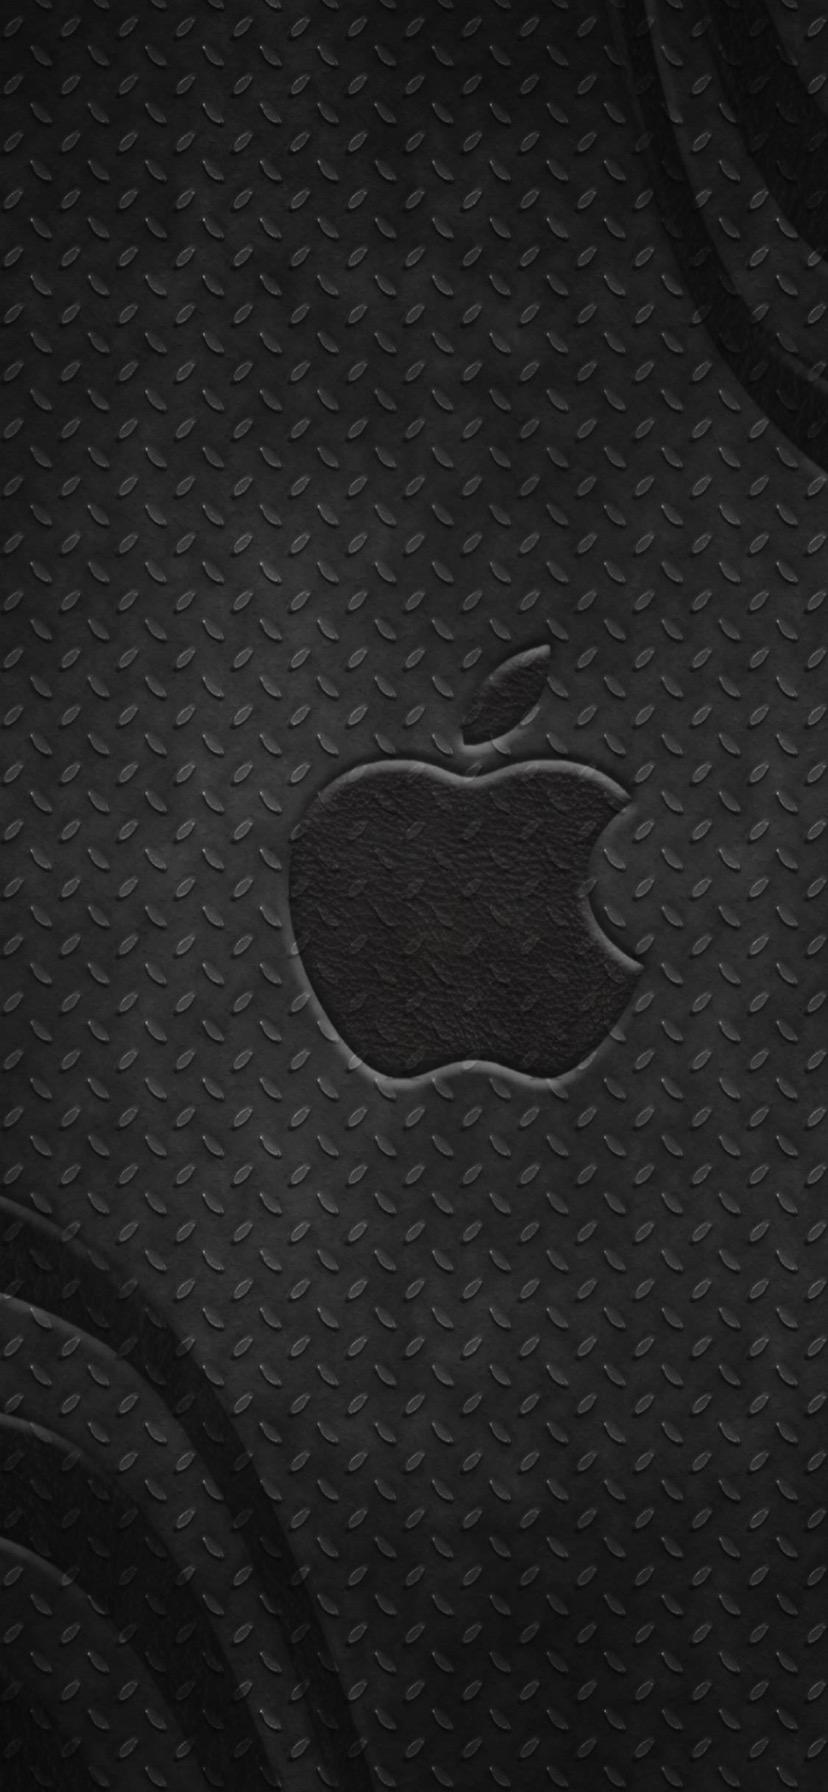 iPhone XR 壁紙 wallpaper 0913